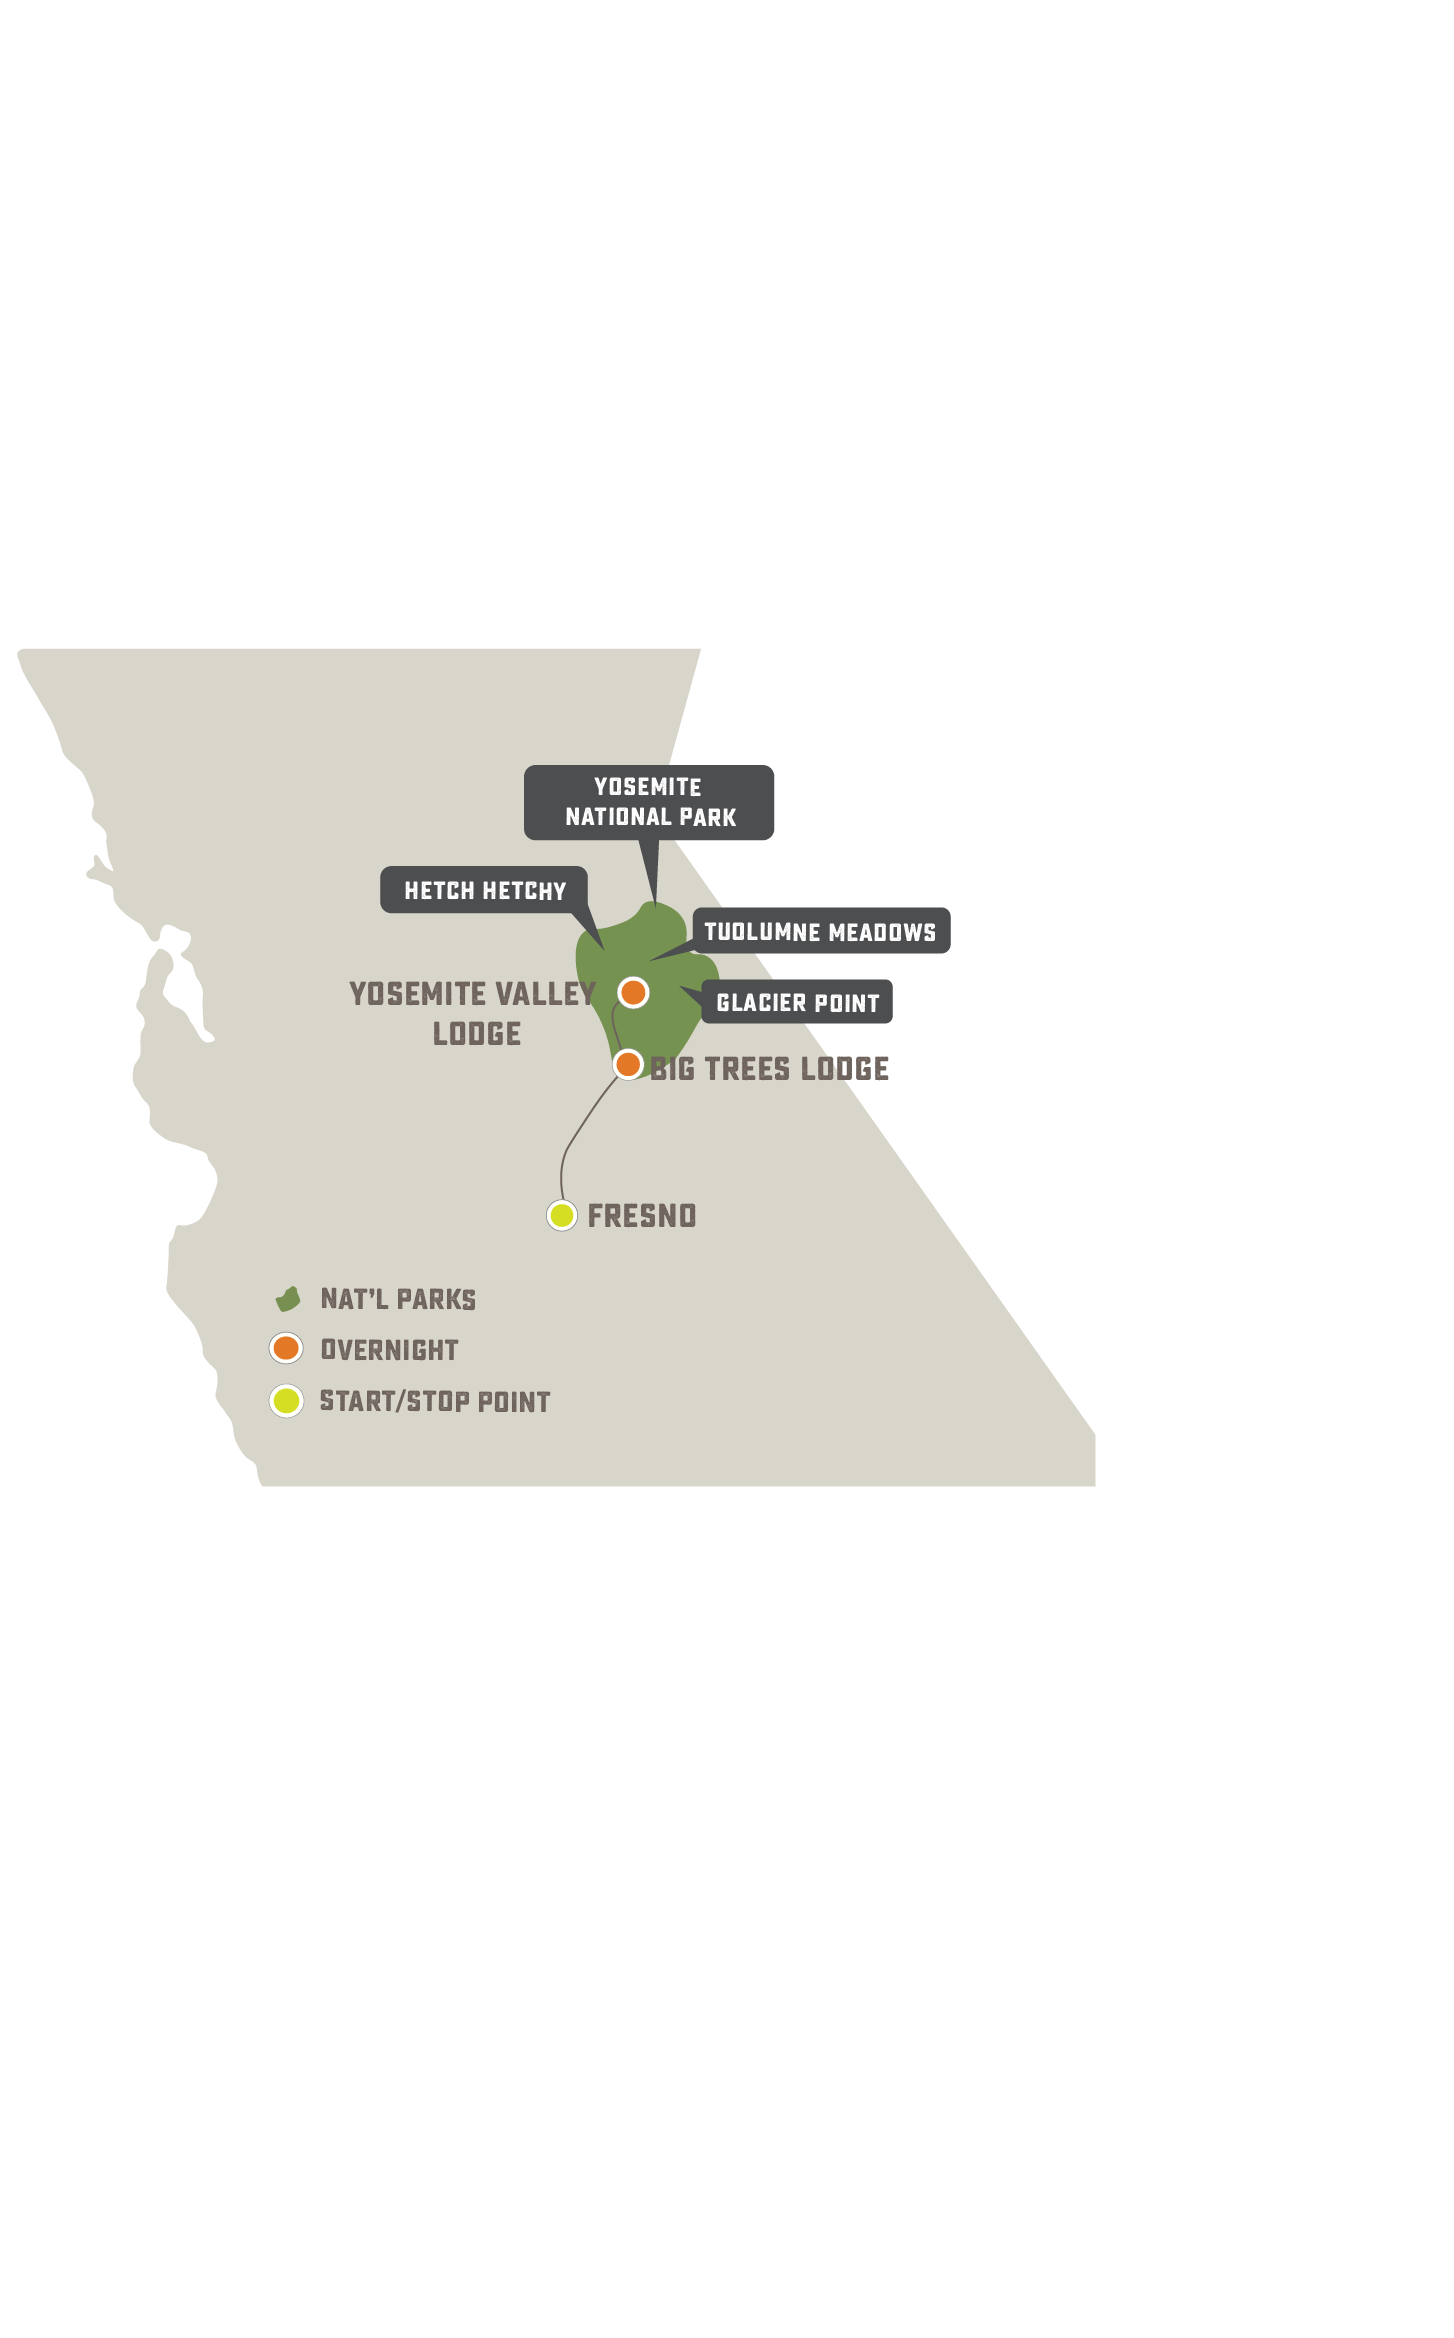 Seasons of Yosemite · National Parks Conservation ociation on long beach landmarks, bakersfield landmarks, west point landmarks, abraham lincoln landmarks, ohio landmarks, mojave desert landmarks, maryland landmarks, grand canyon landmarks, san jose landmarks, new york landmarks, mountain basin region landmarks, cajun country landmarks, susanville landmarks, anaheim landmarks, long island landmarks,